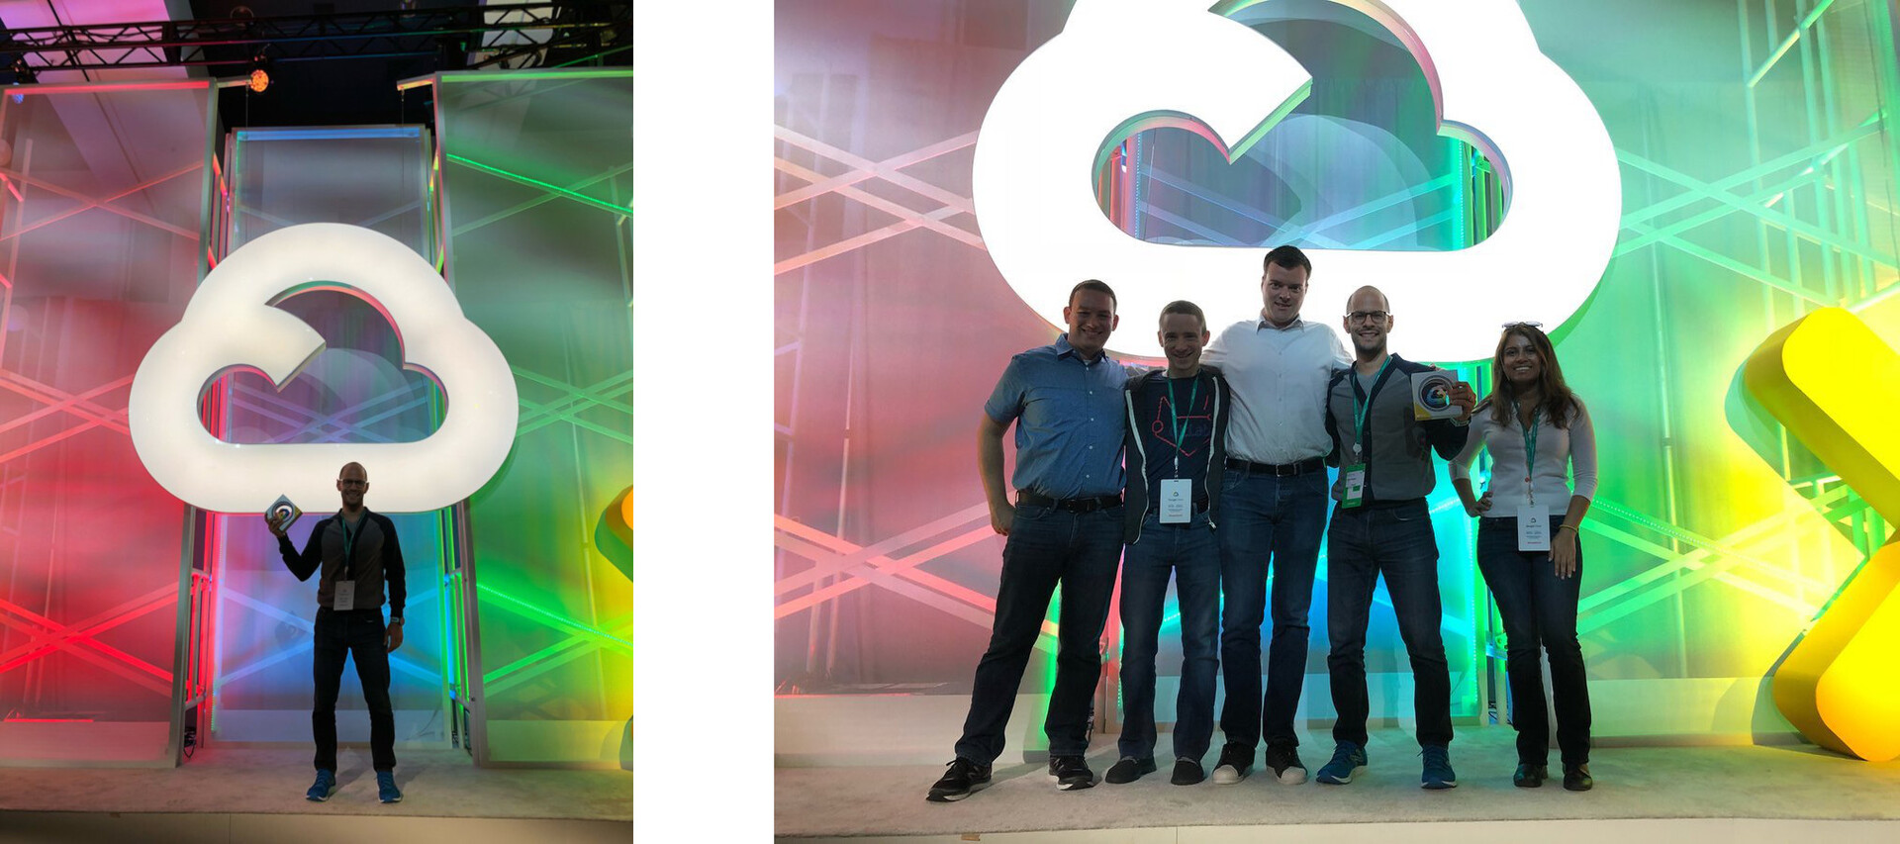 Eliran Mesika with GitLab's award + GitLab team with award